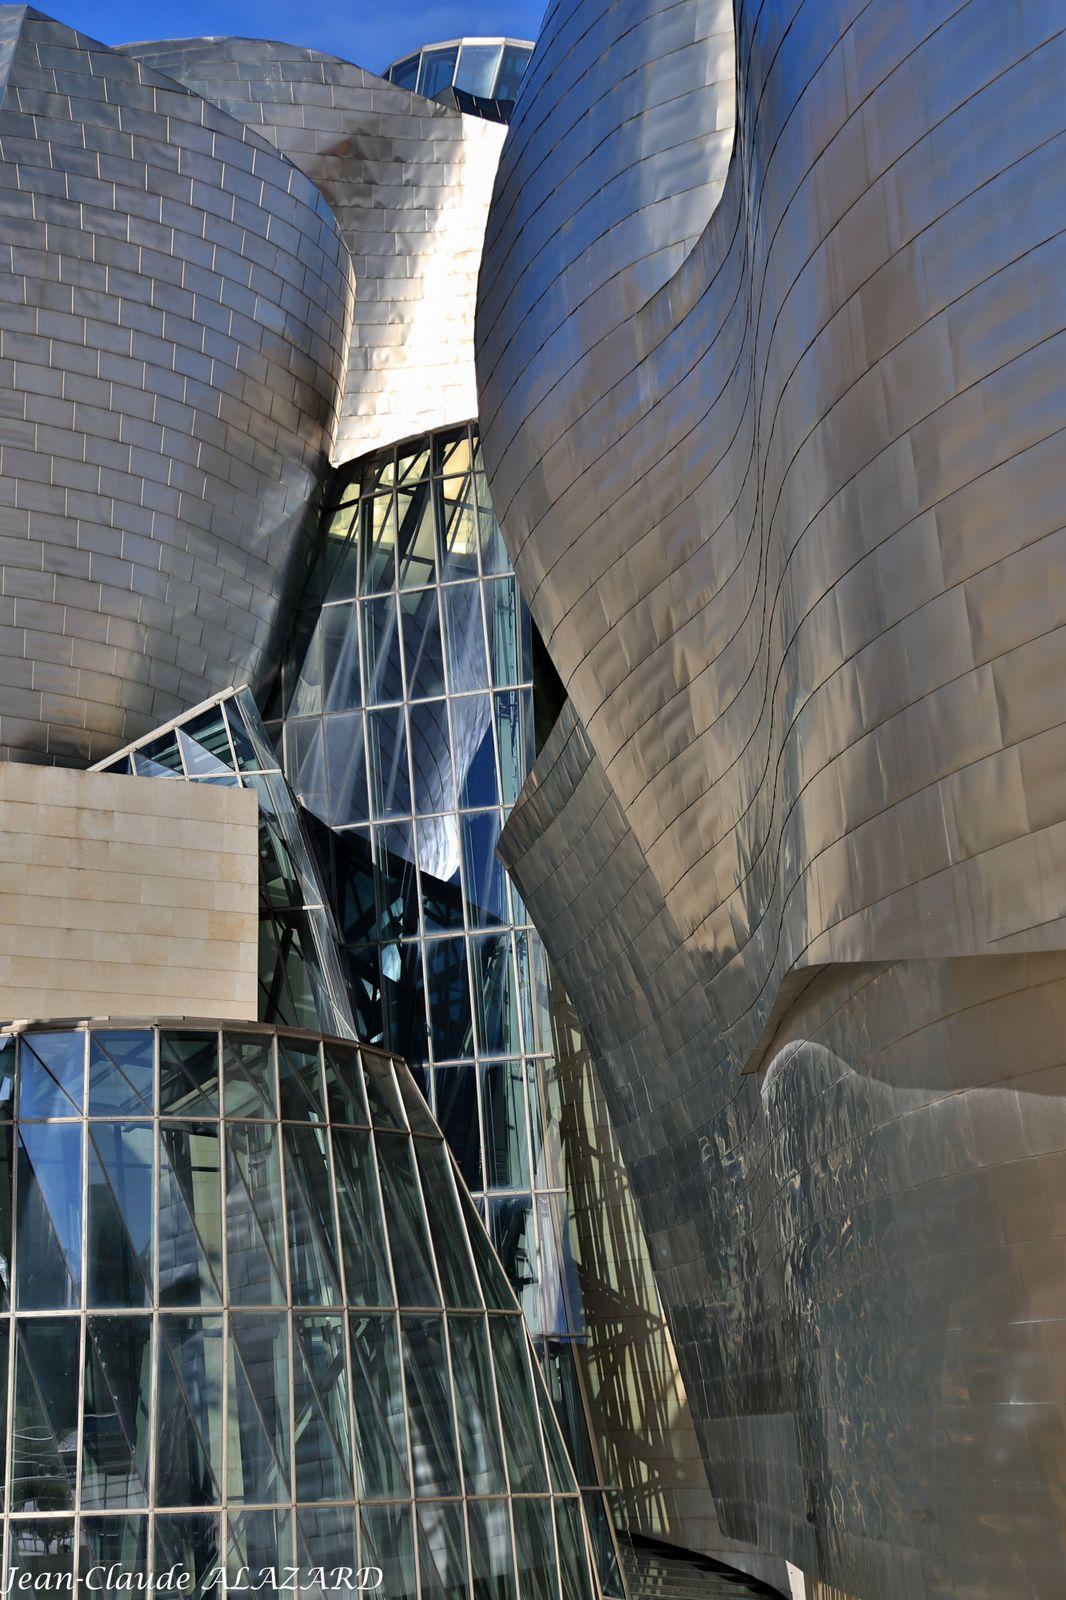 Bilbao : Photos autour du Musée Guggenheim